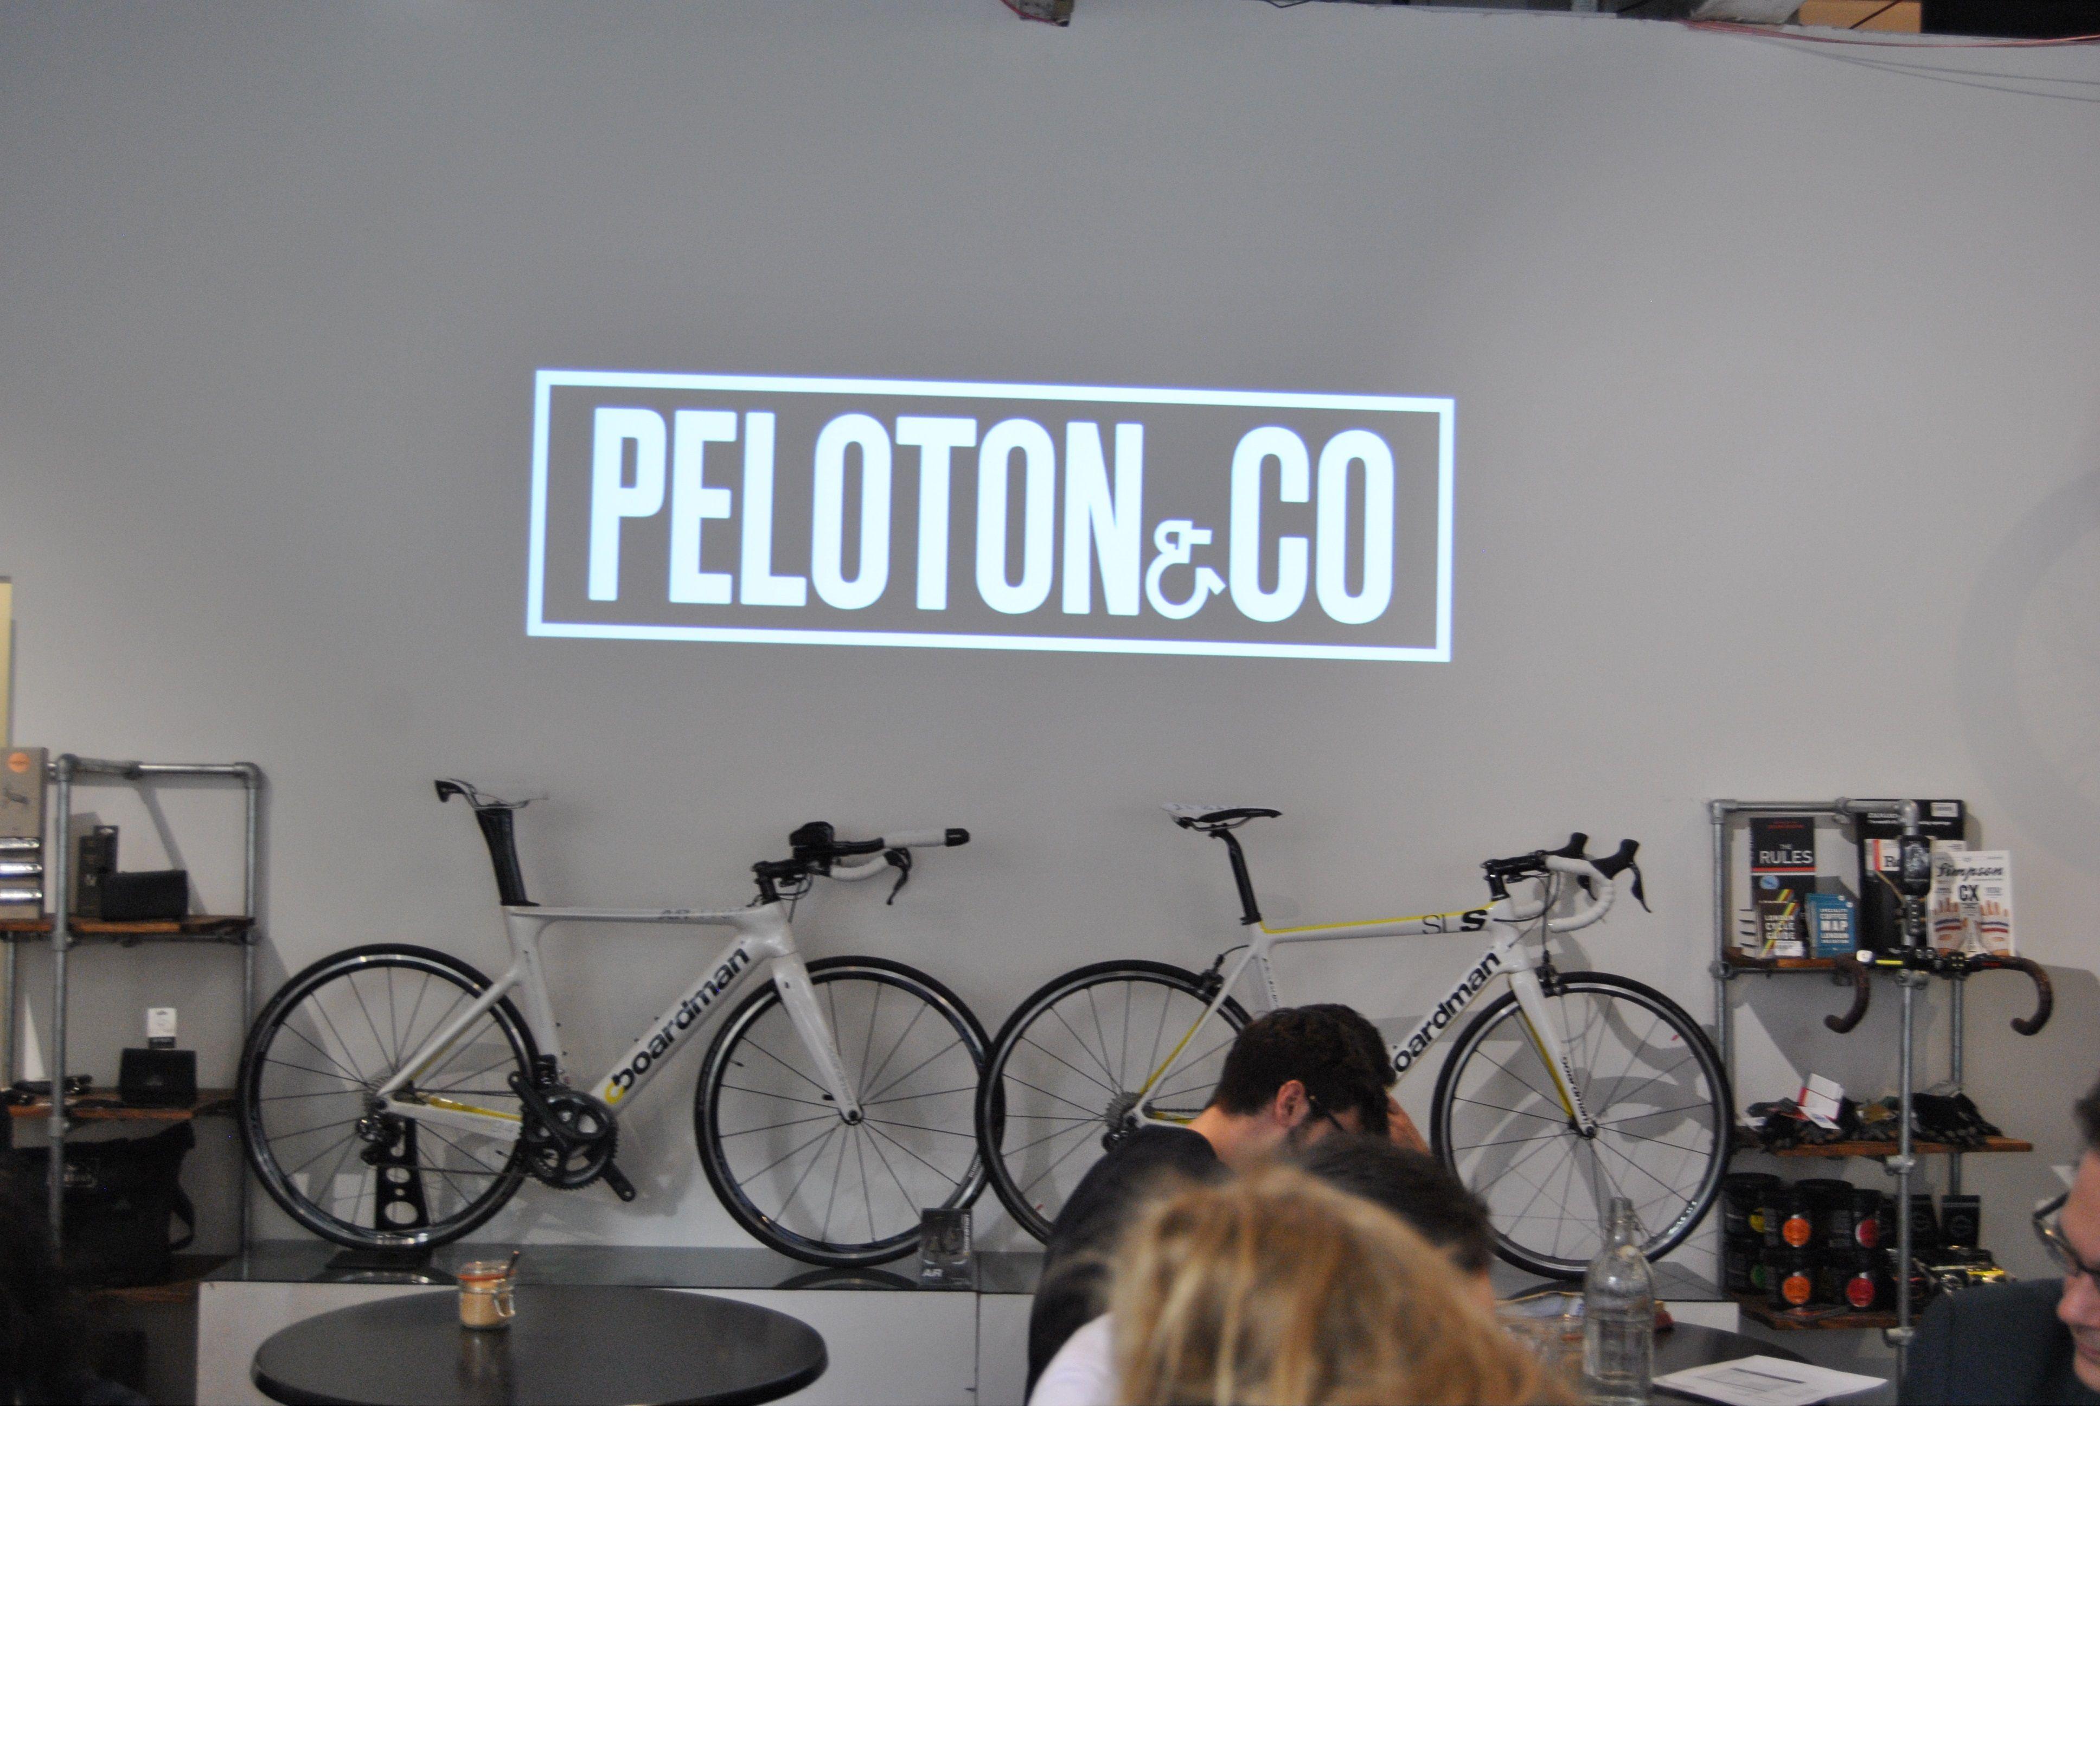 Peloton & Co Bike Cafe!